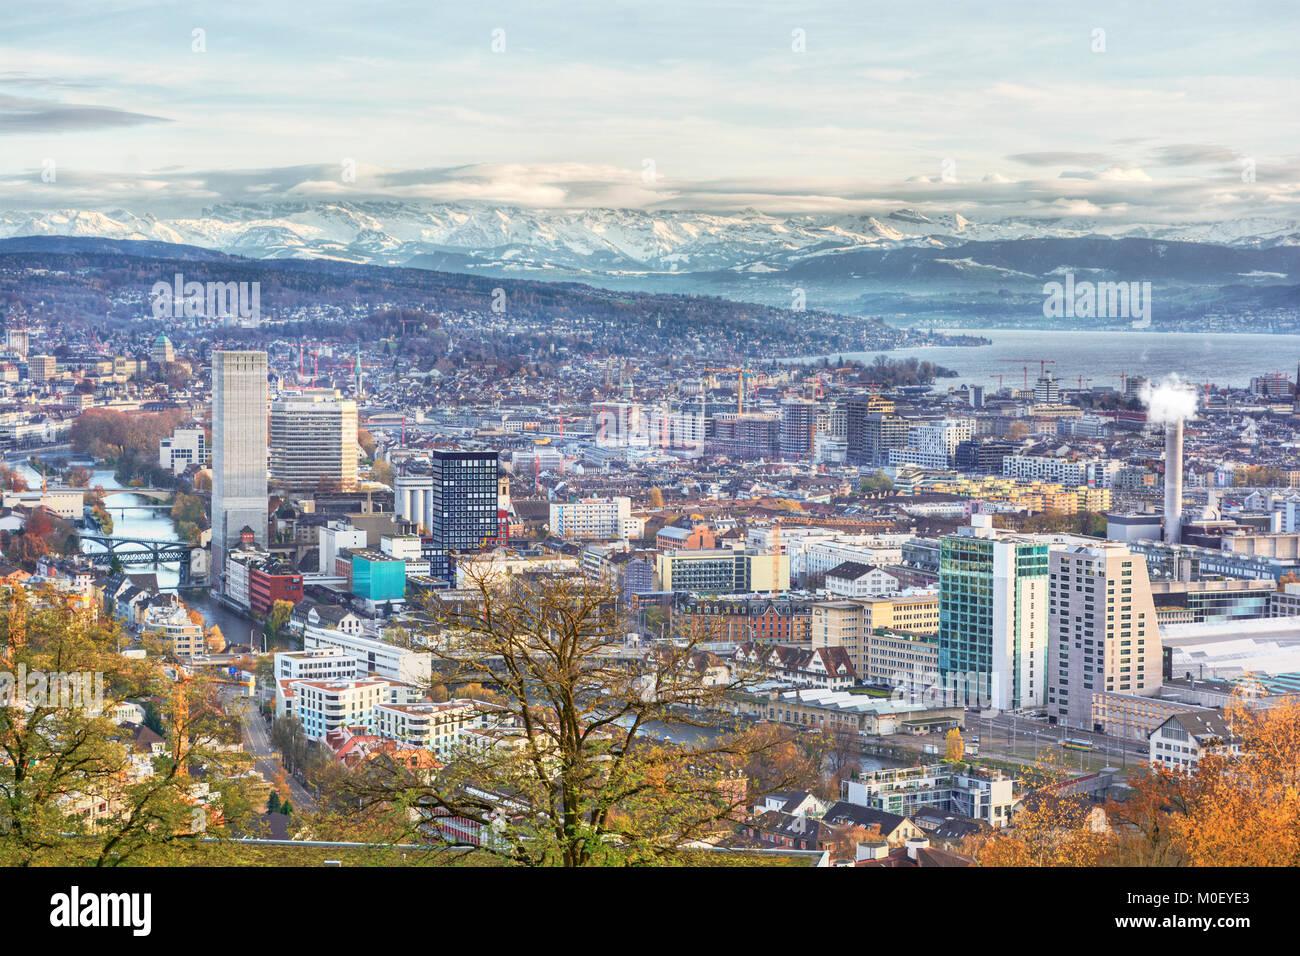 Cityscape of Zurich (Switzerland), HDR-technique - Stock Image